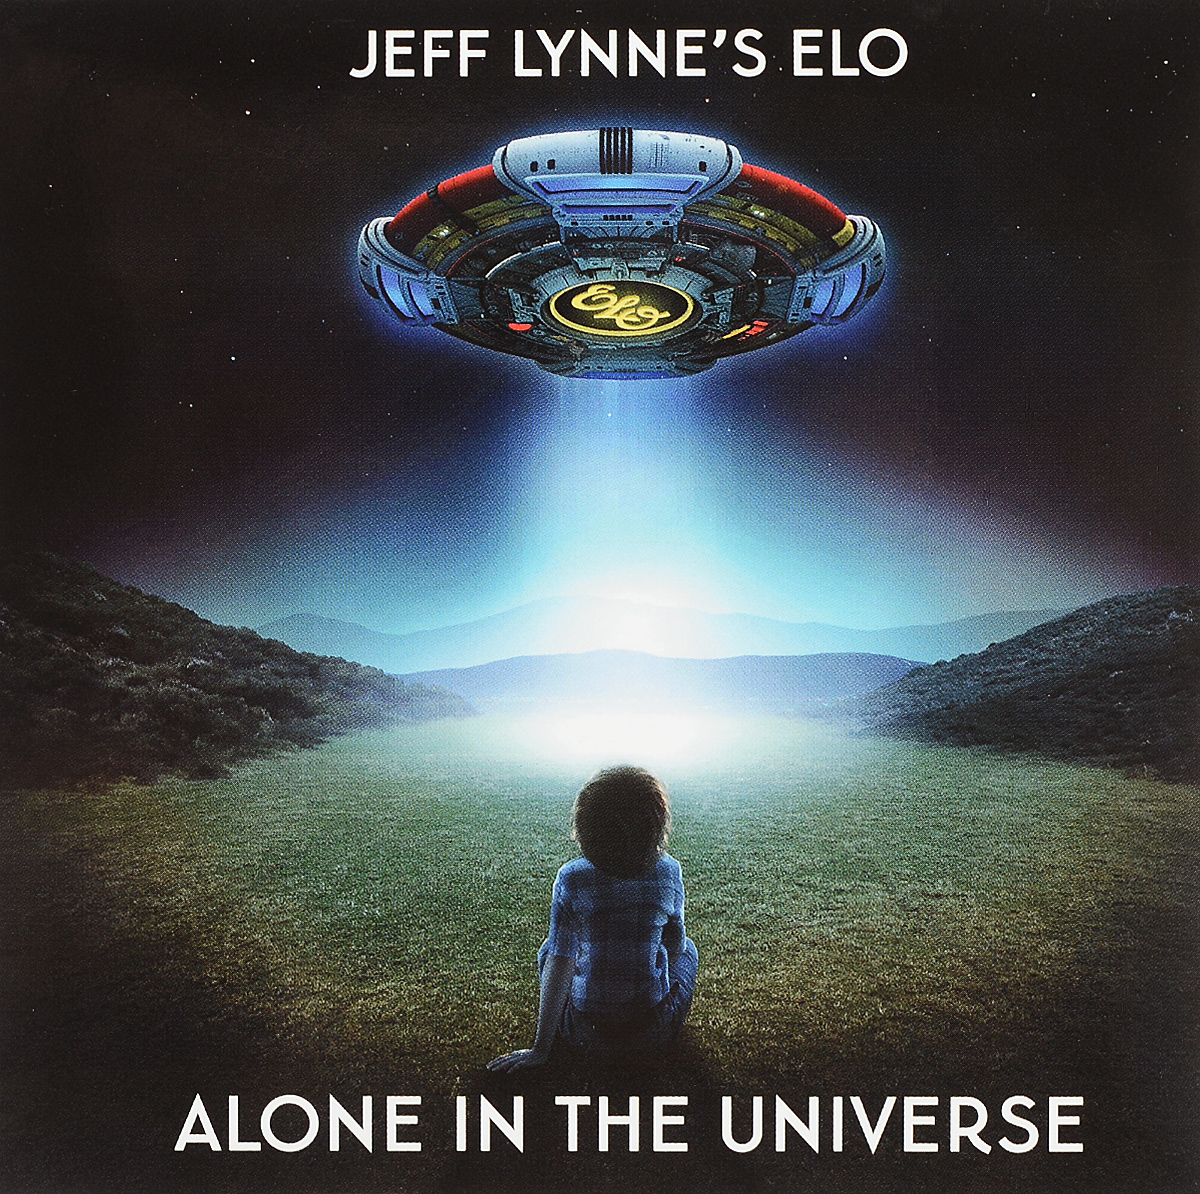 Electric Light Orchestra Jeff Lynne's Elo. Alone In The Universe electric light orchestra electric light orchestra jeff lynne s elo alone in the universe